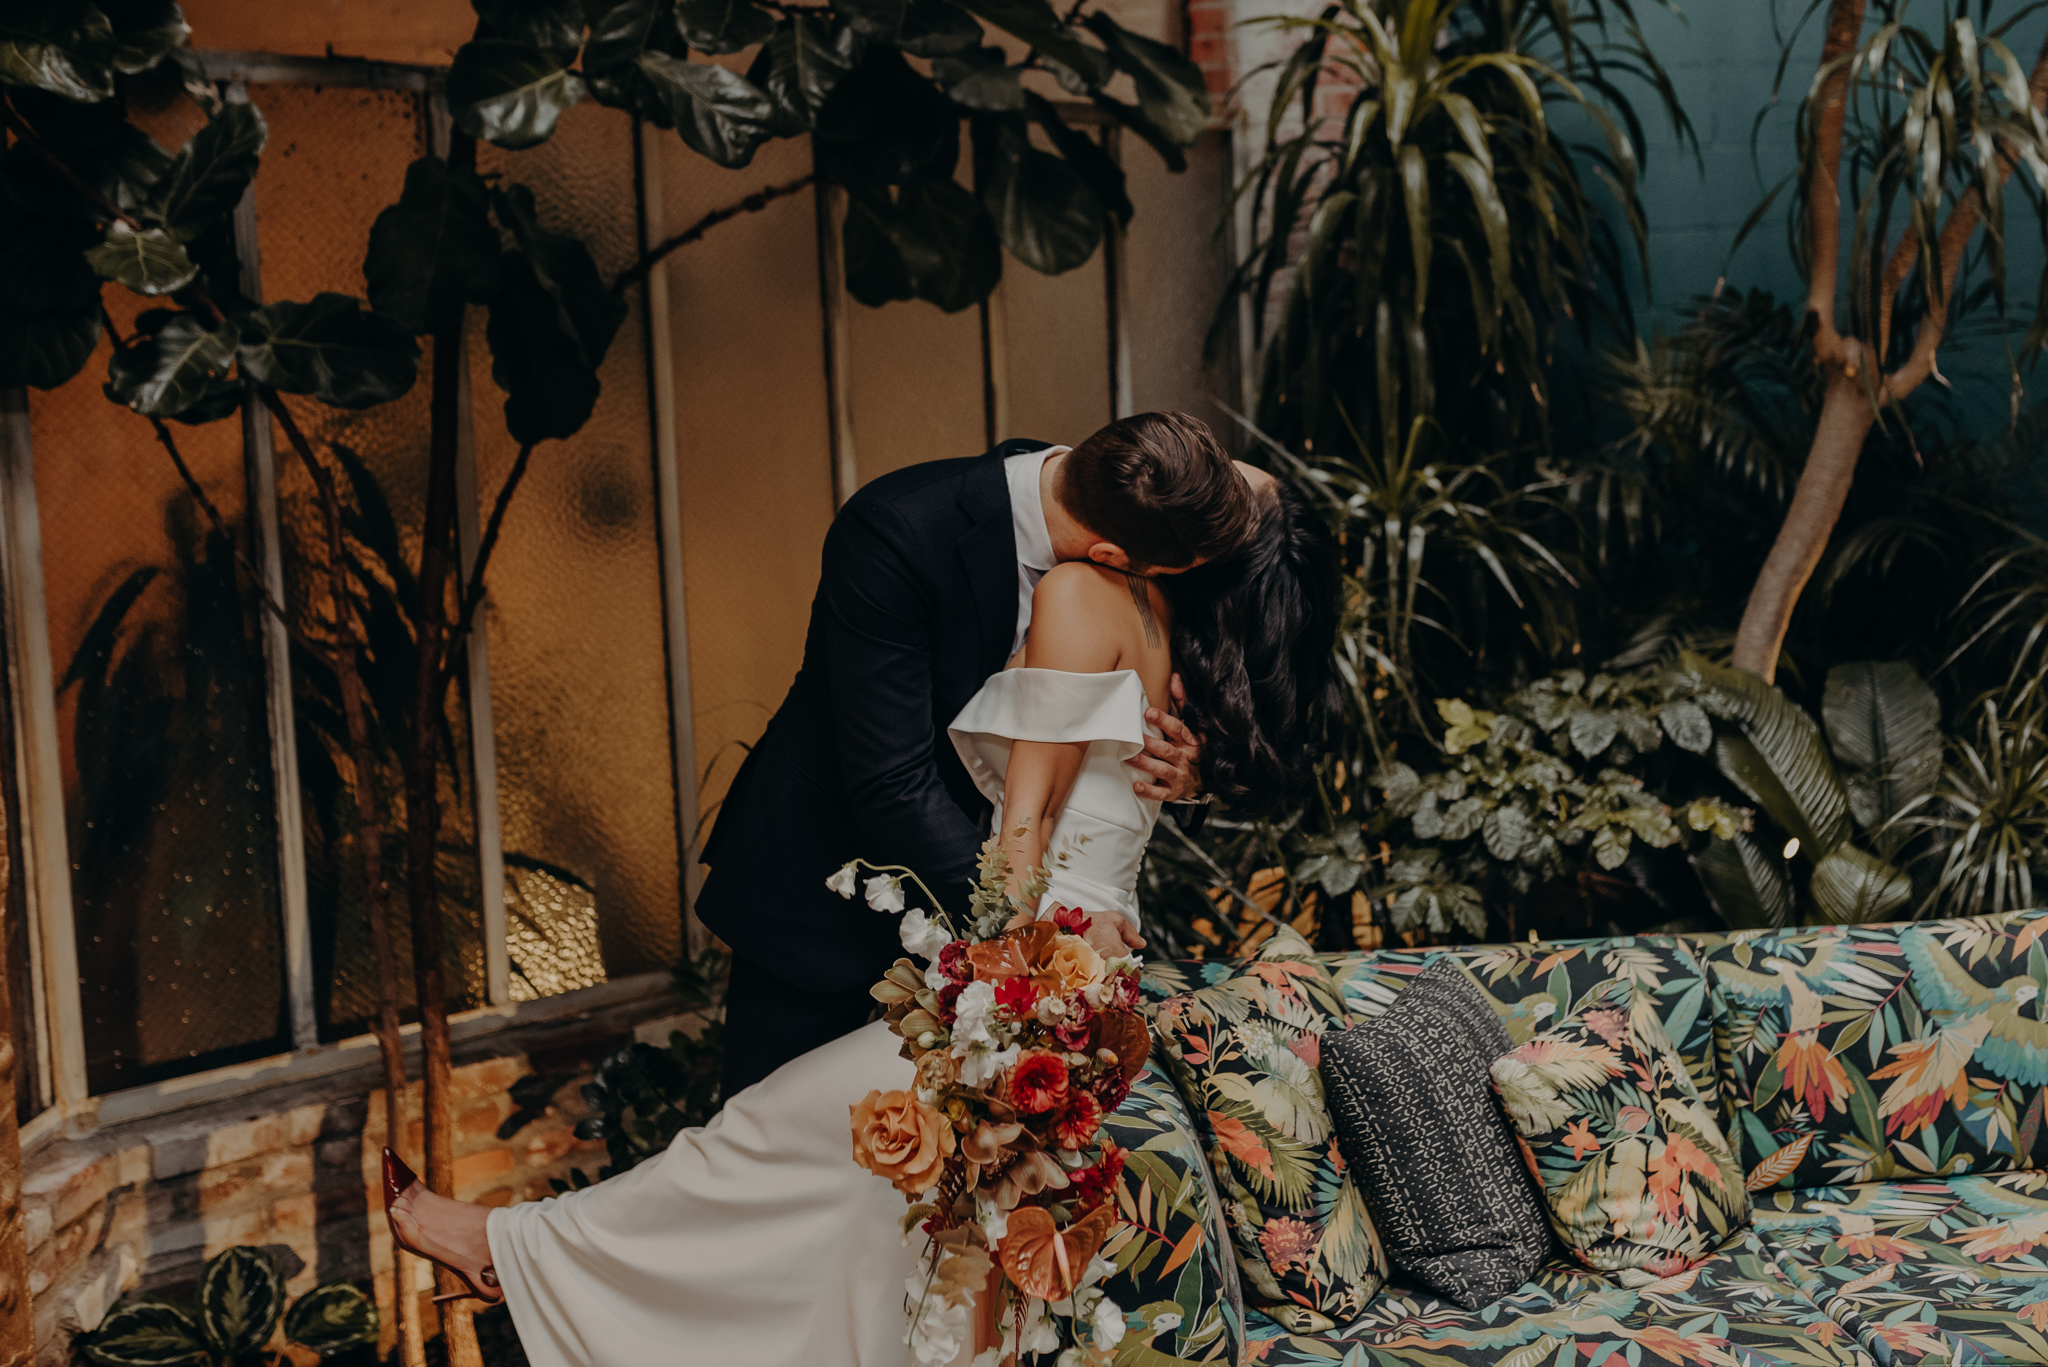 Wedding Photo LA - wedding photographer in los angeles - millwick wedding venue -isaiahandtaylor.com-030.jpg